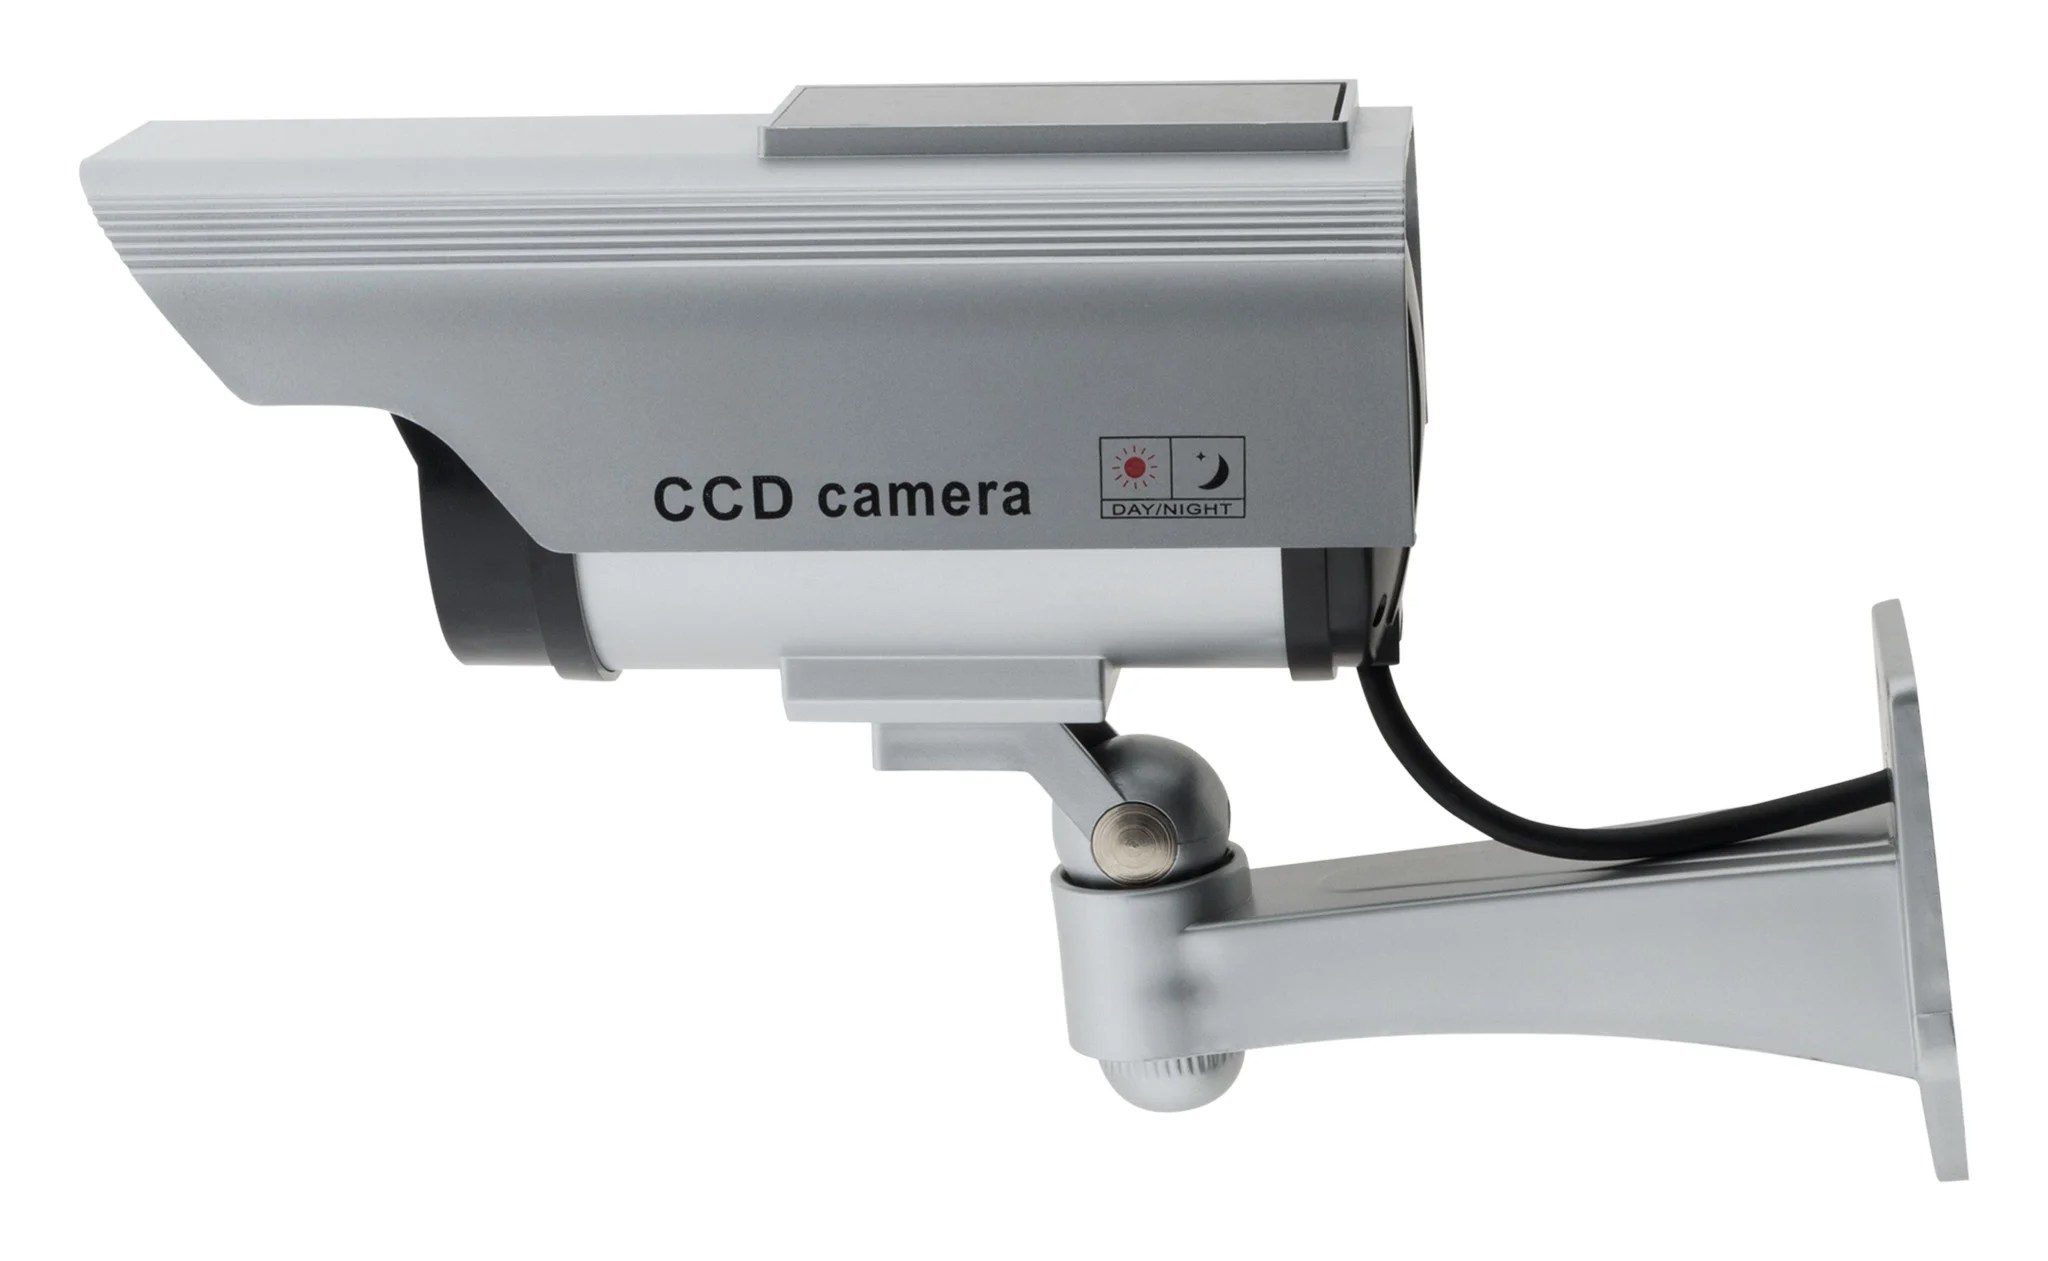 Camera Factice Leroy Merlin